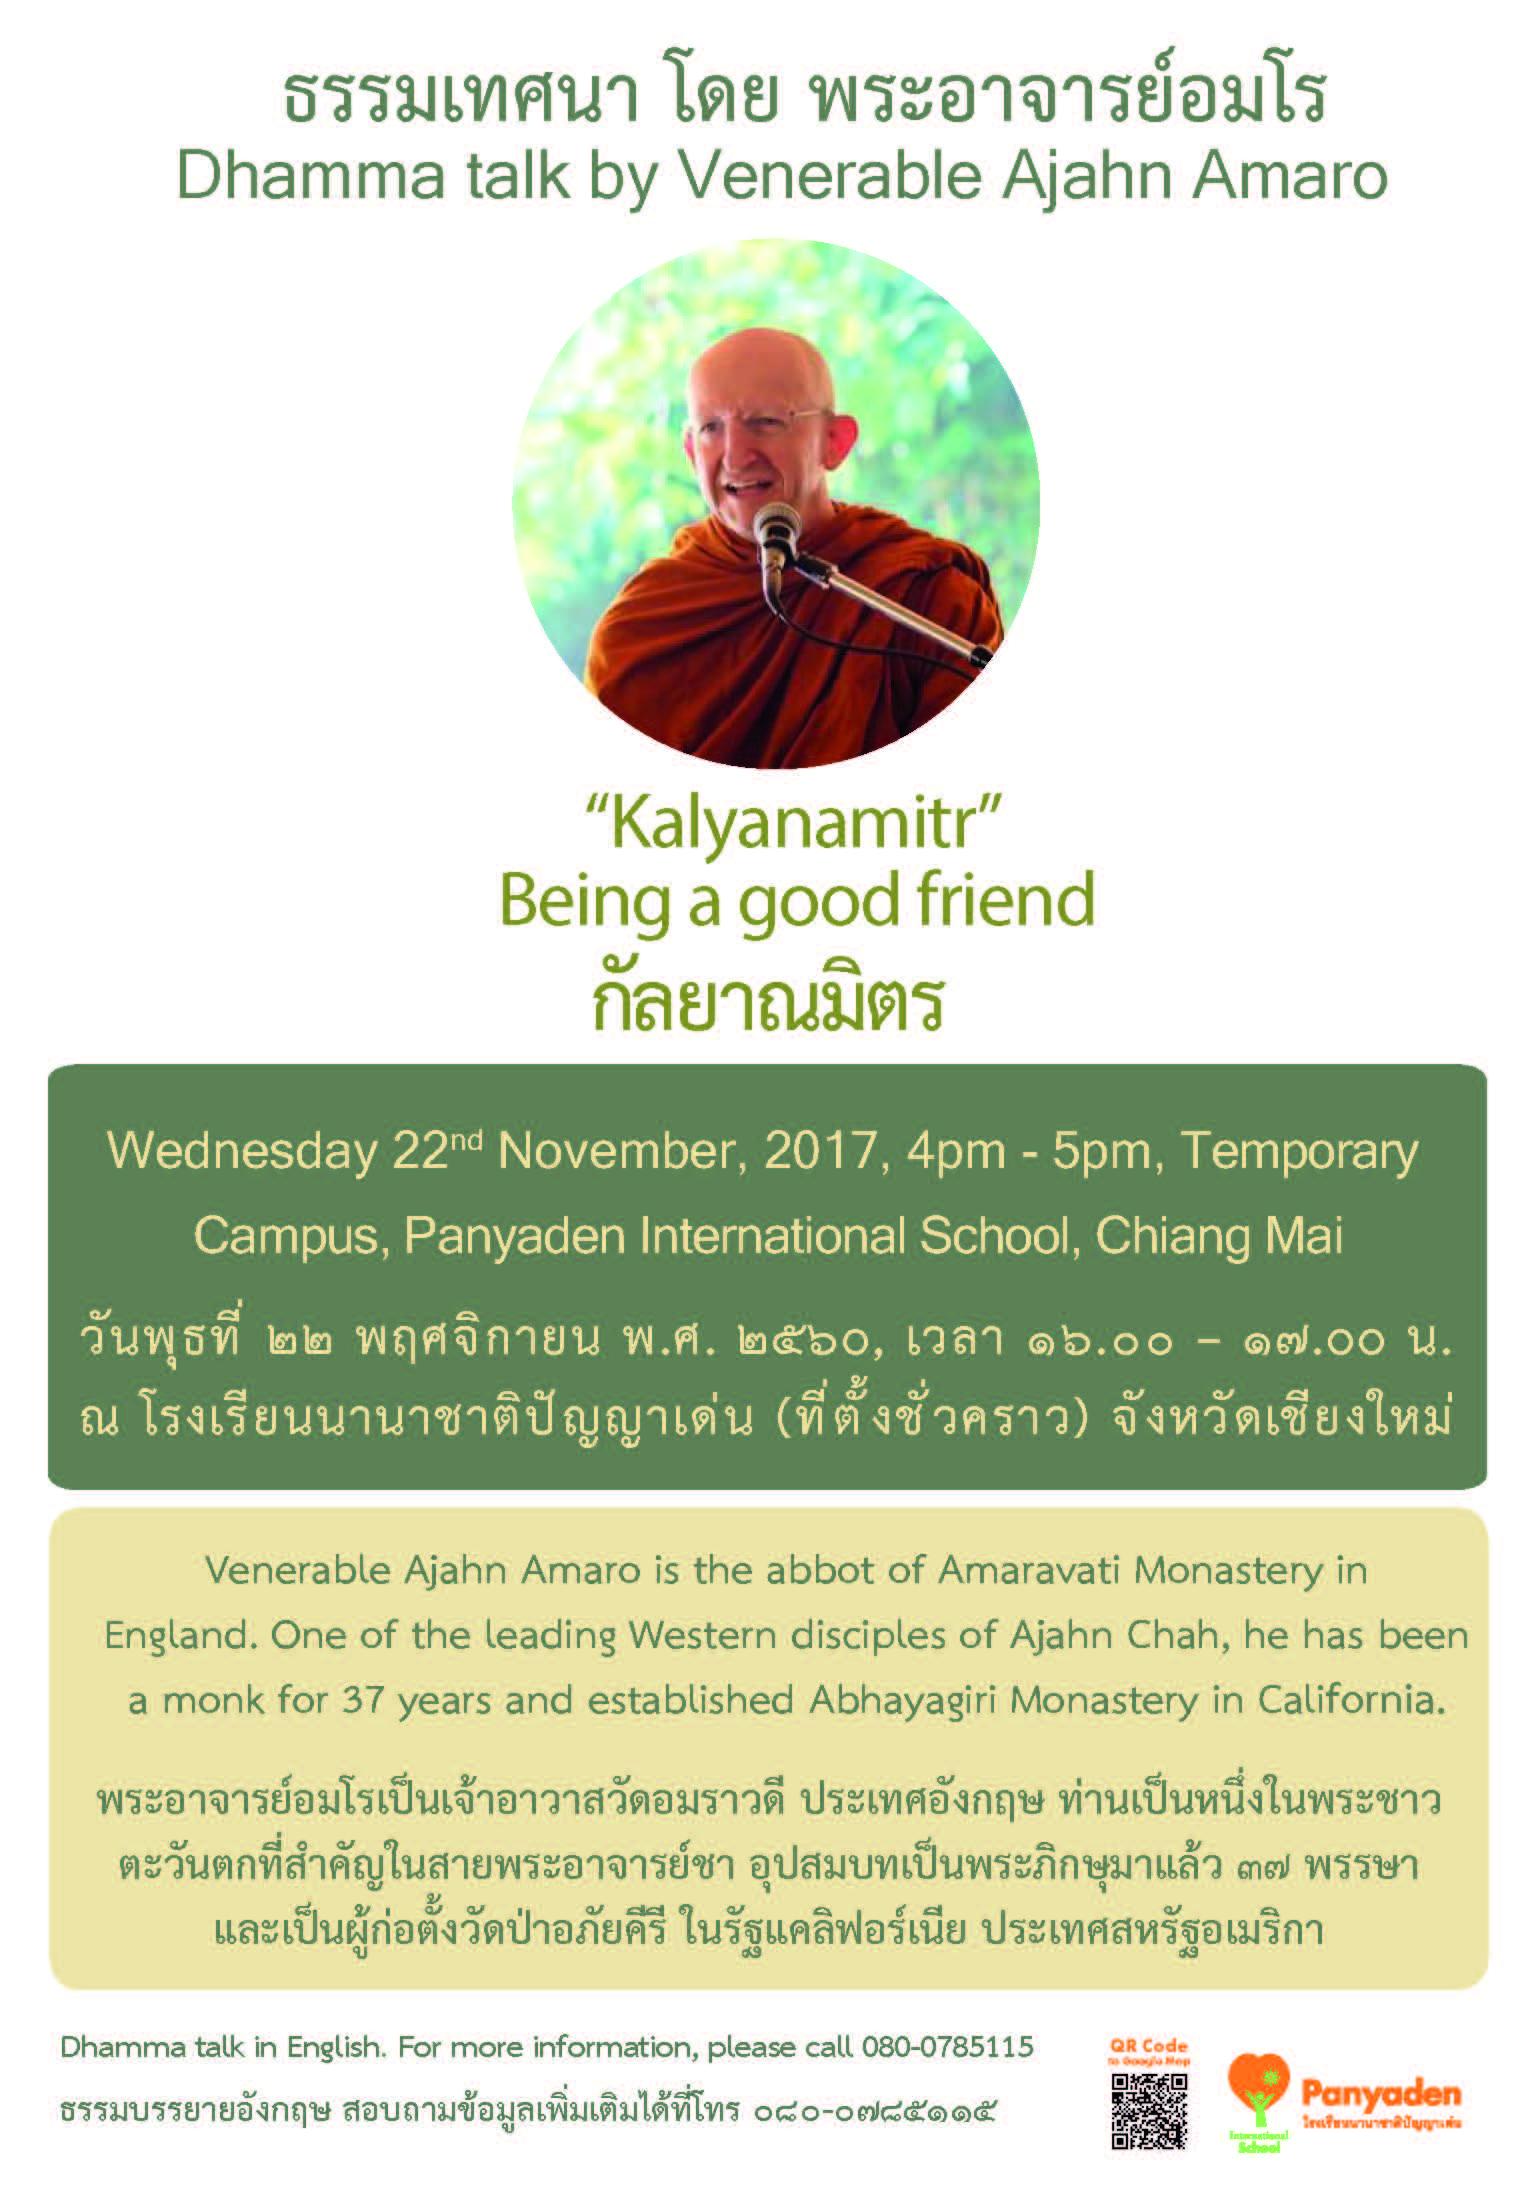 Poster Dhamma Talk_Ven.Amaro_22 Nov 2017 final